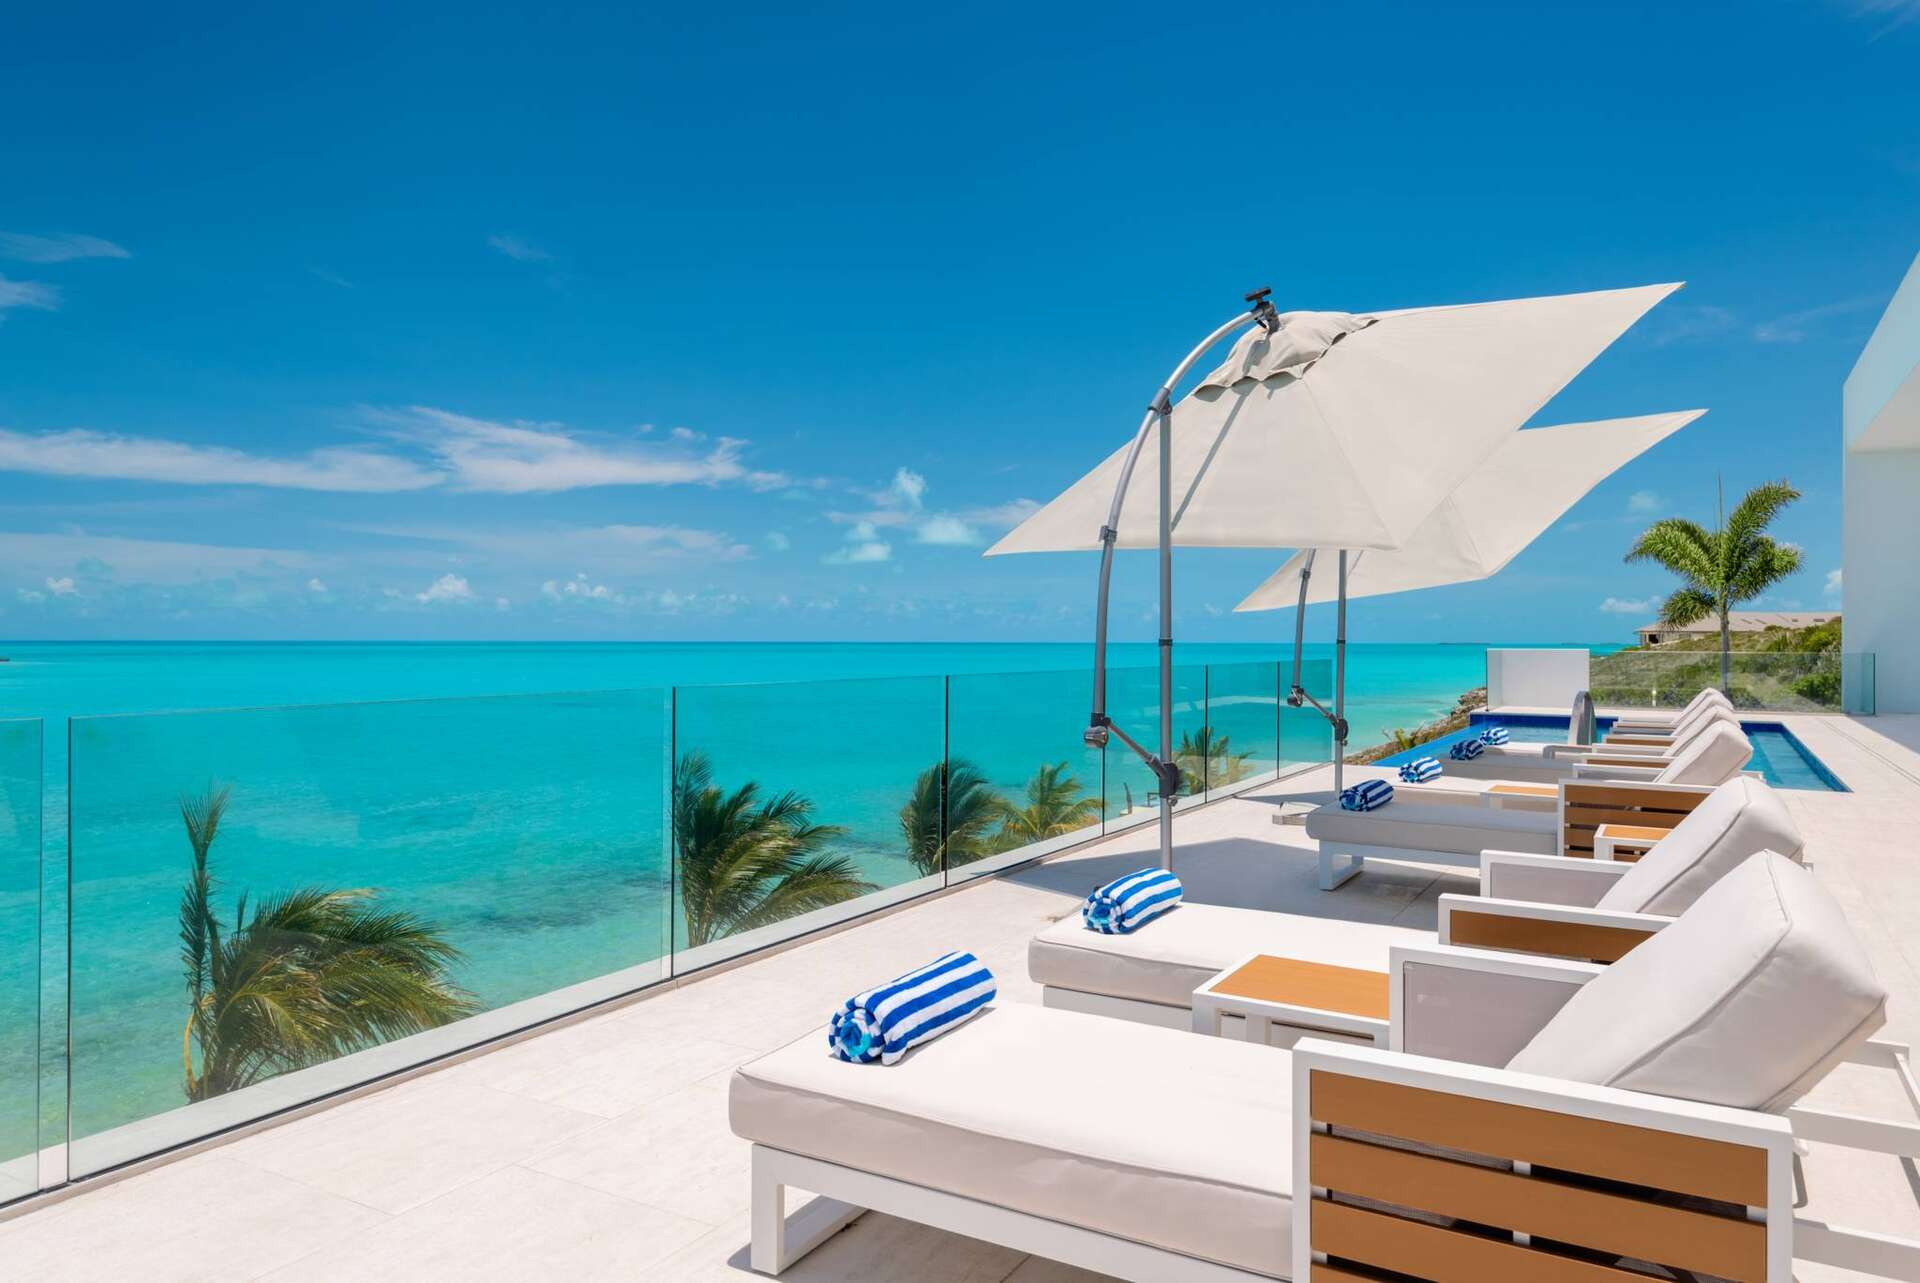 Luxury villa rentals caribbean - Turks and caicos - Providenciales - Turtle tail - Blue Vista - Image 1/31